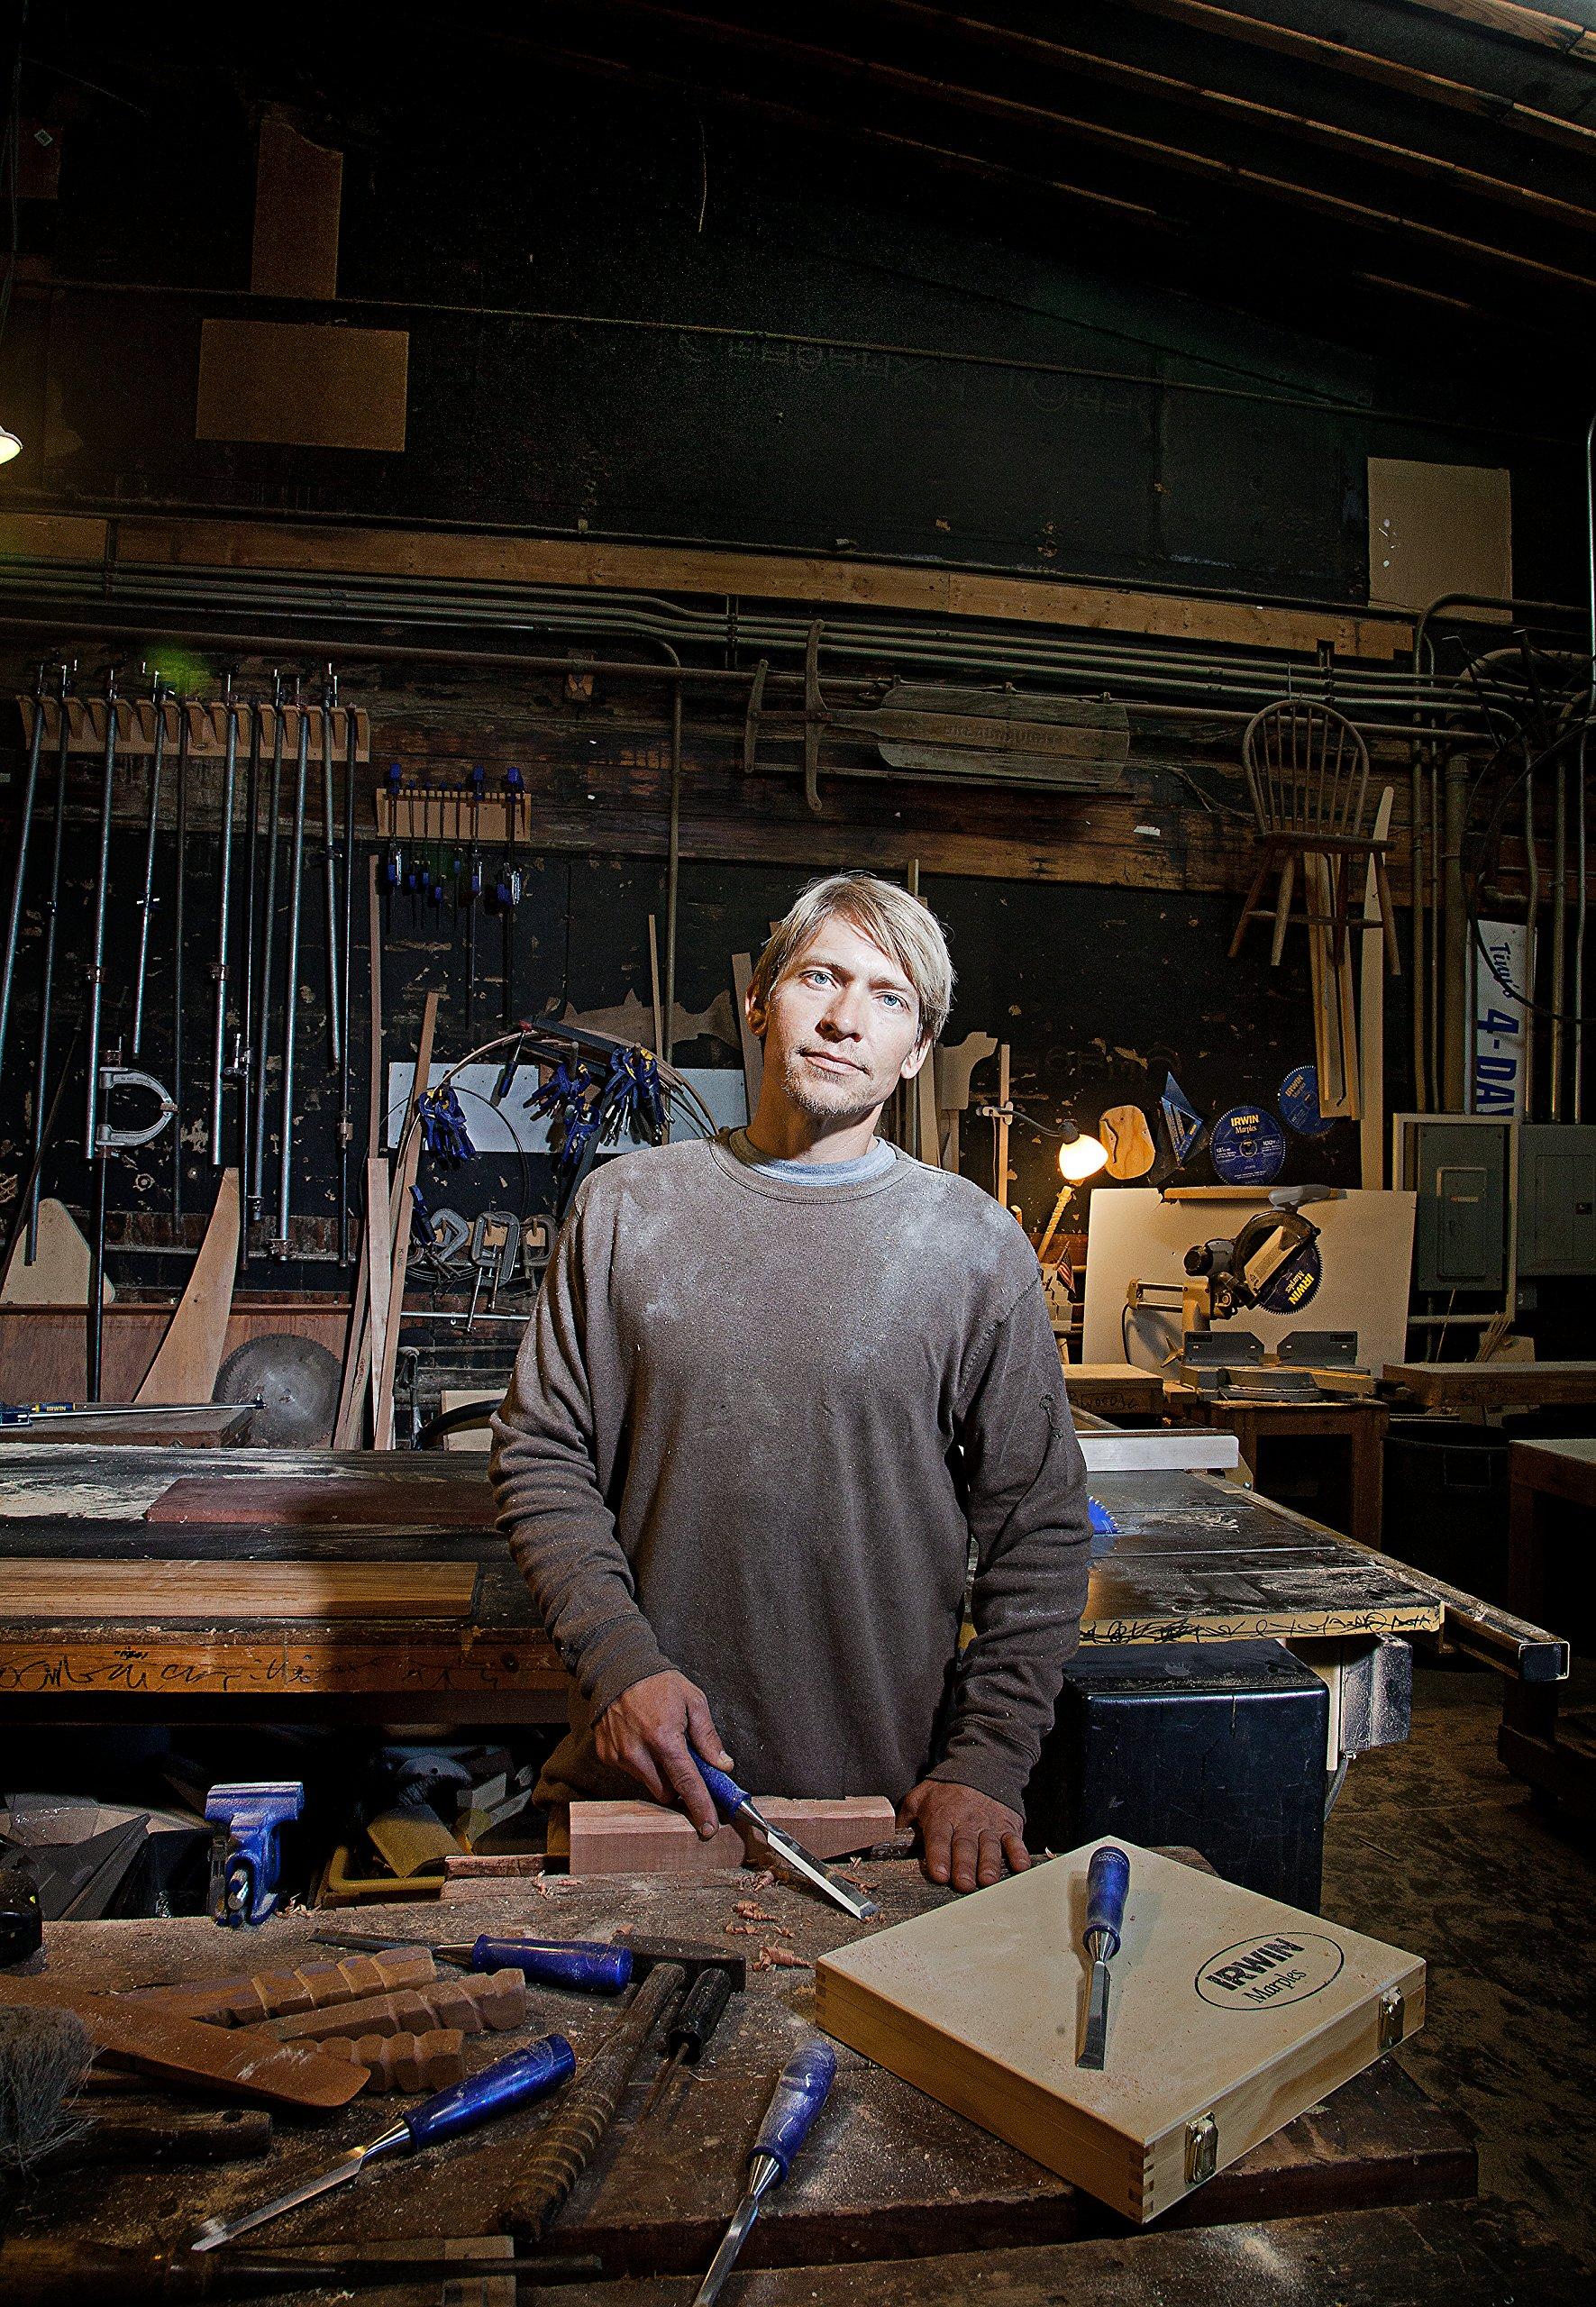 Irwin Tools Marples Woodworking Chisel Set, 6 Piece, M444SB6N by Irwin Tools